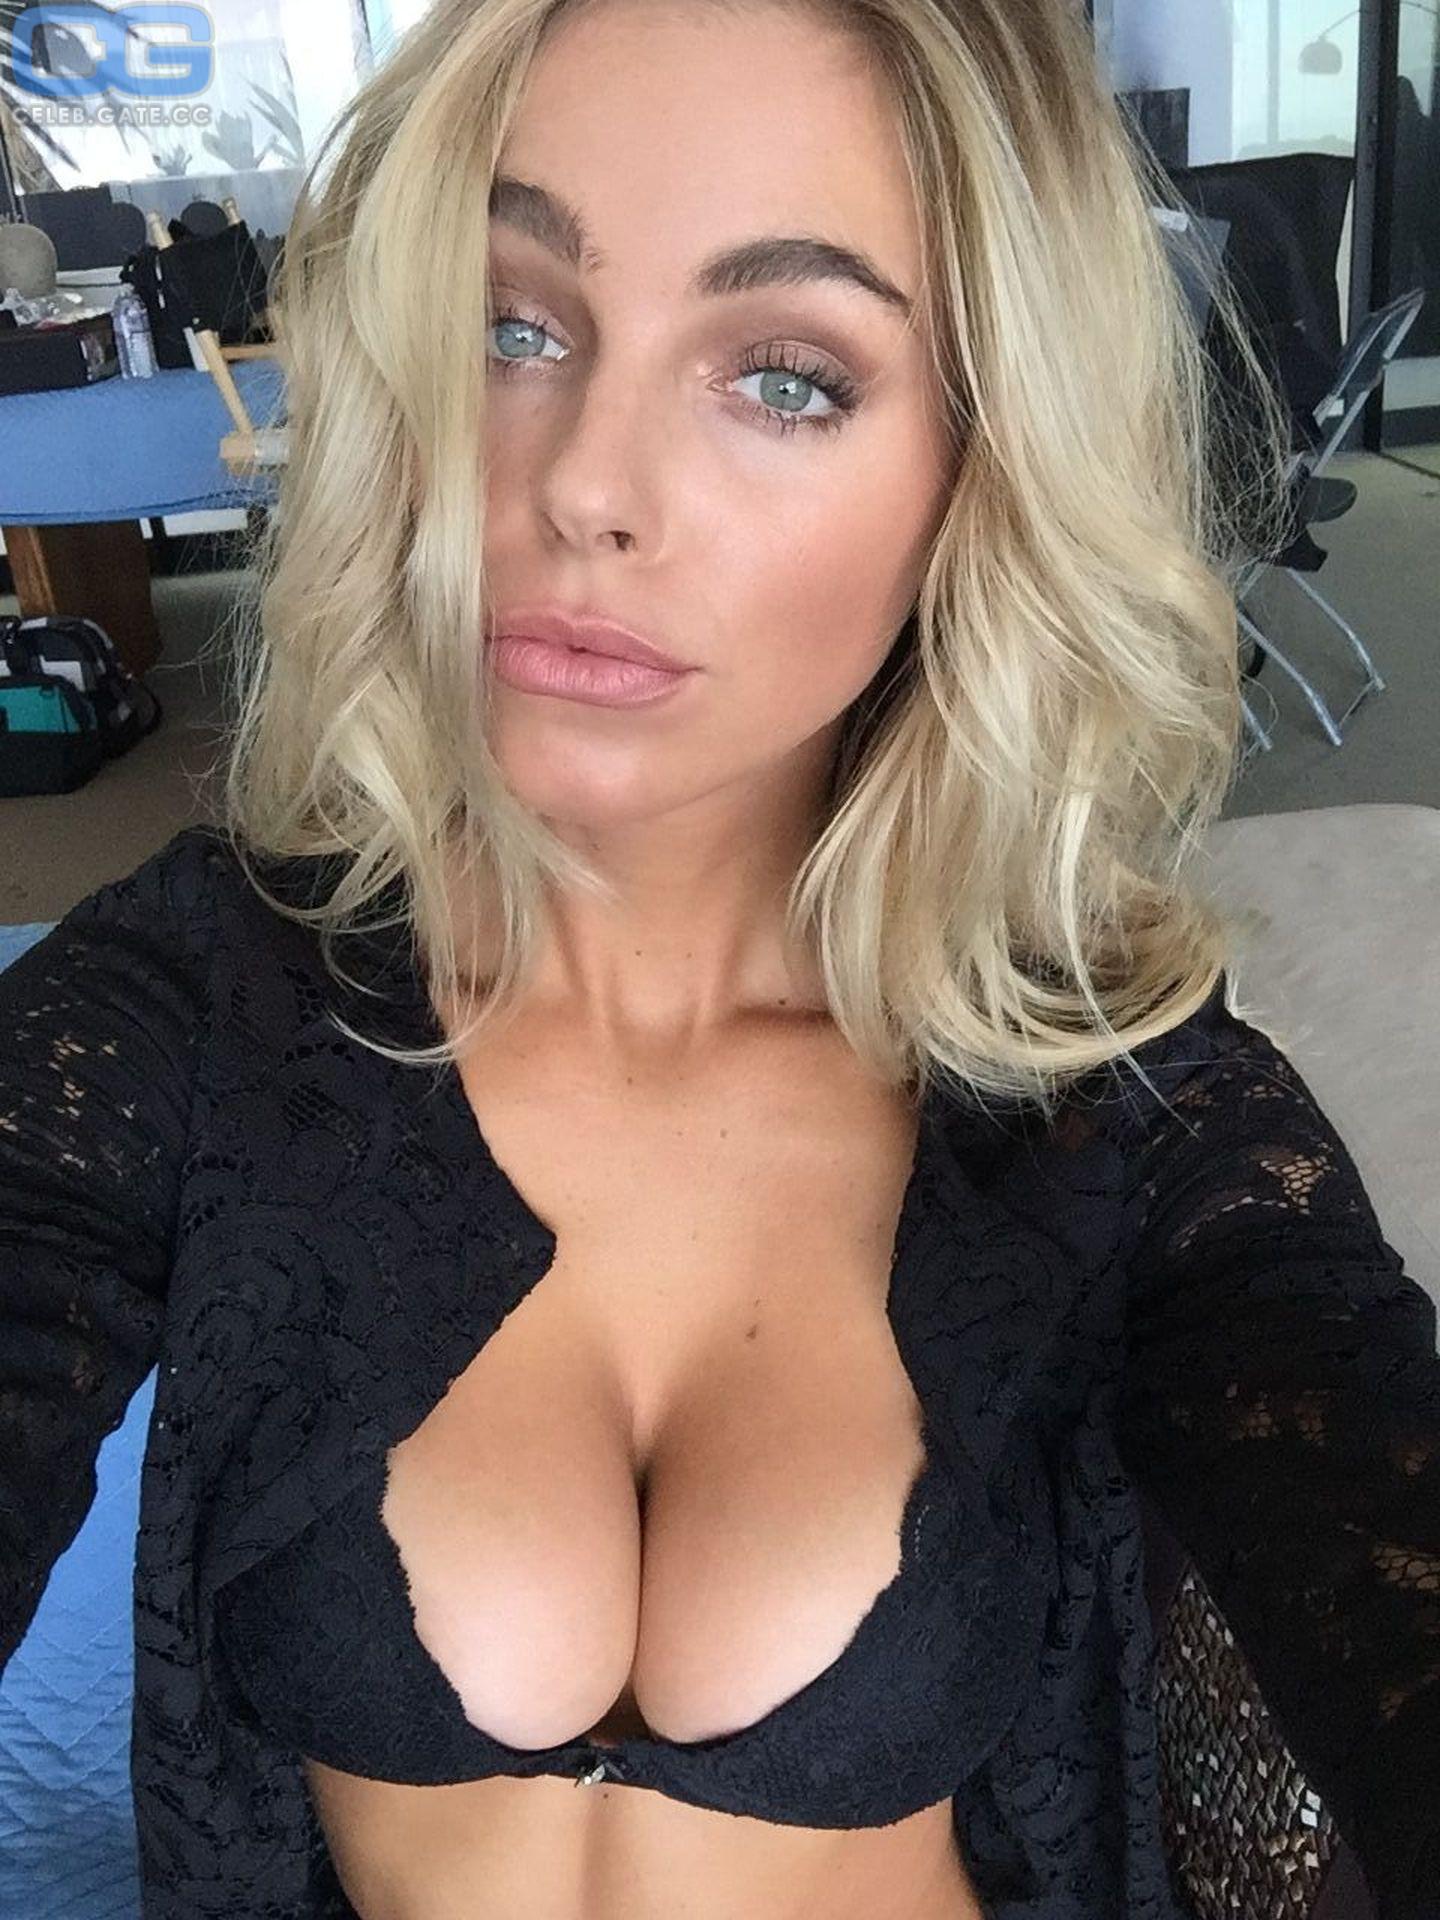 Emilia bernsdorf nackt bilder